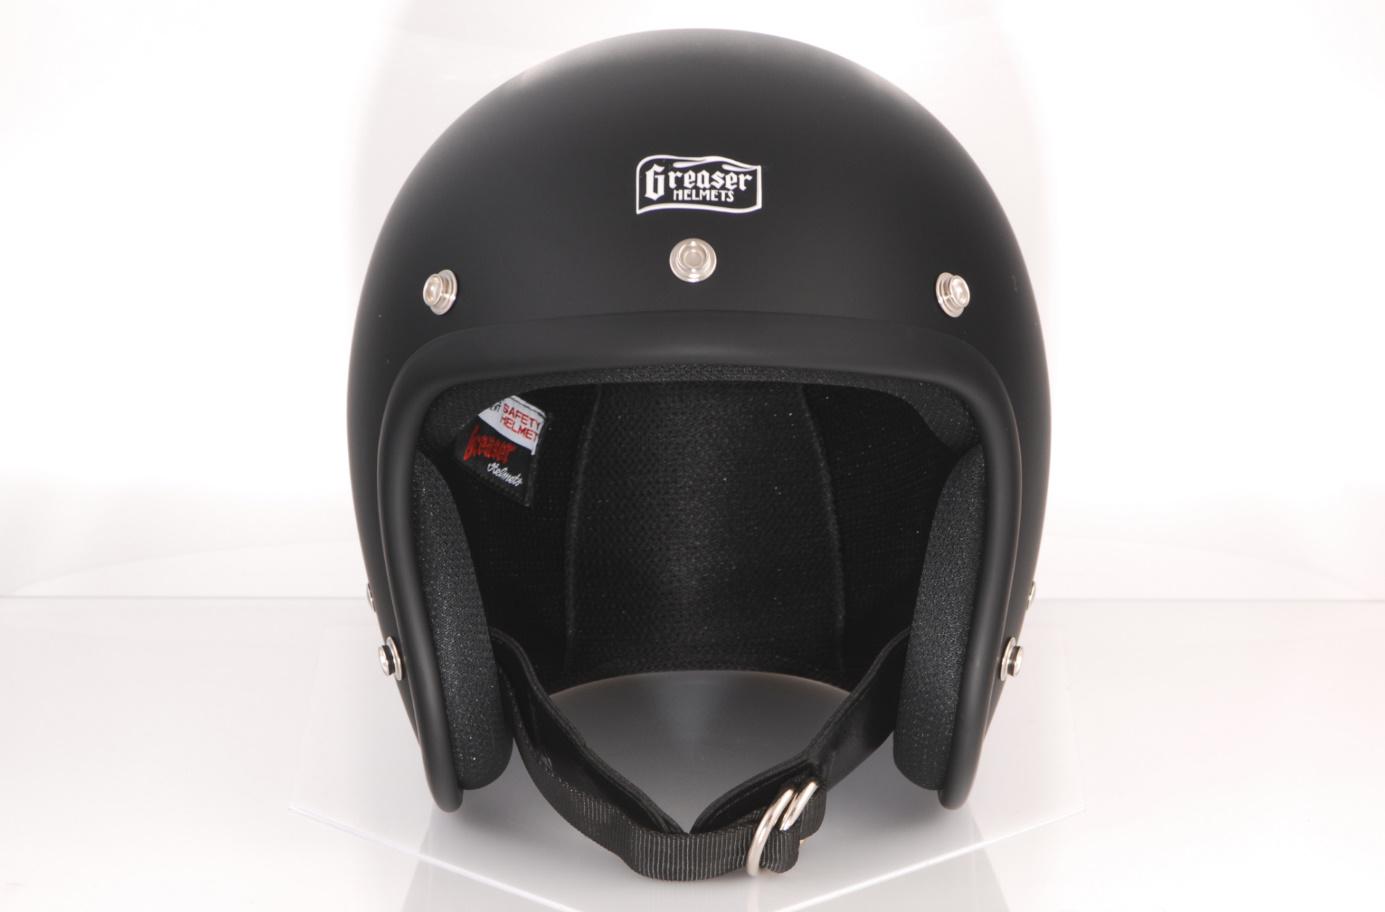 GREASER 60's PLAIN ジェットヘルメット マットブラック S(55cm~56cm) GREASER(グリーサー)